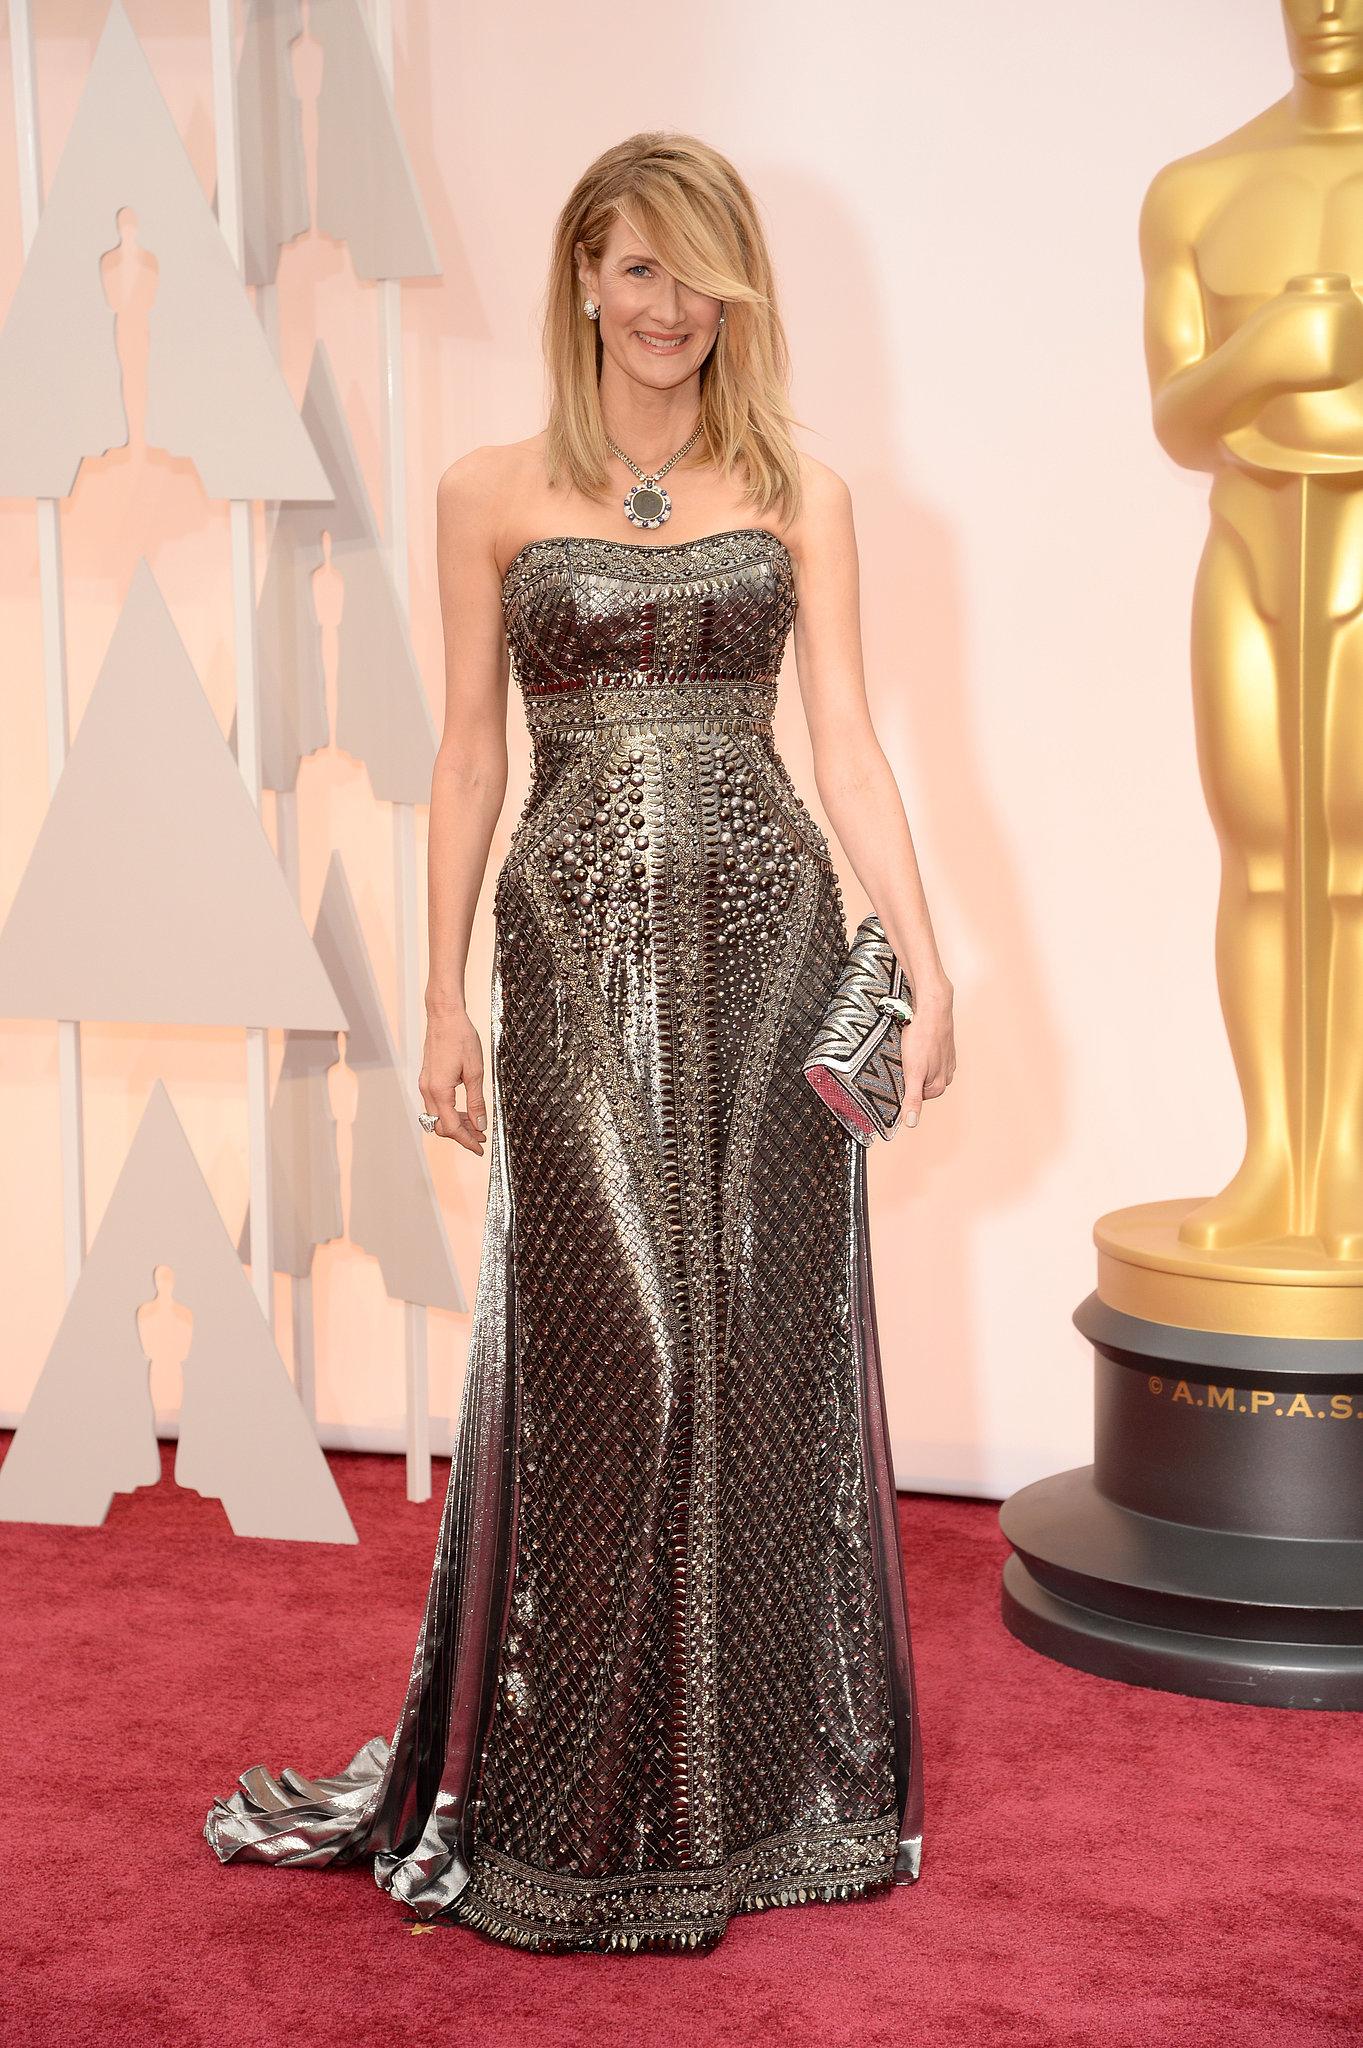 Oscars 2015: My Dress Picks